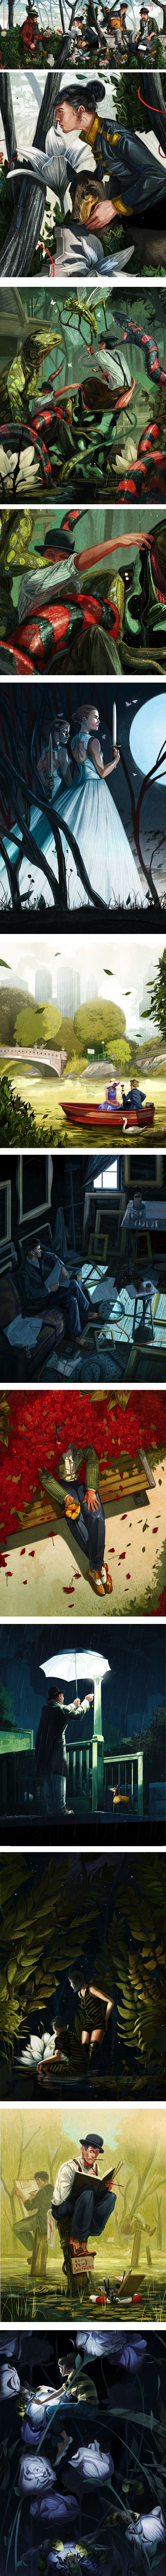 Jonathan Bartlett, illustration